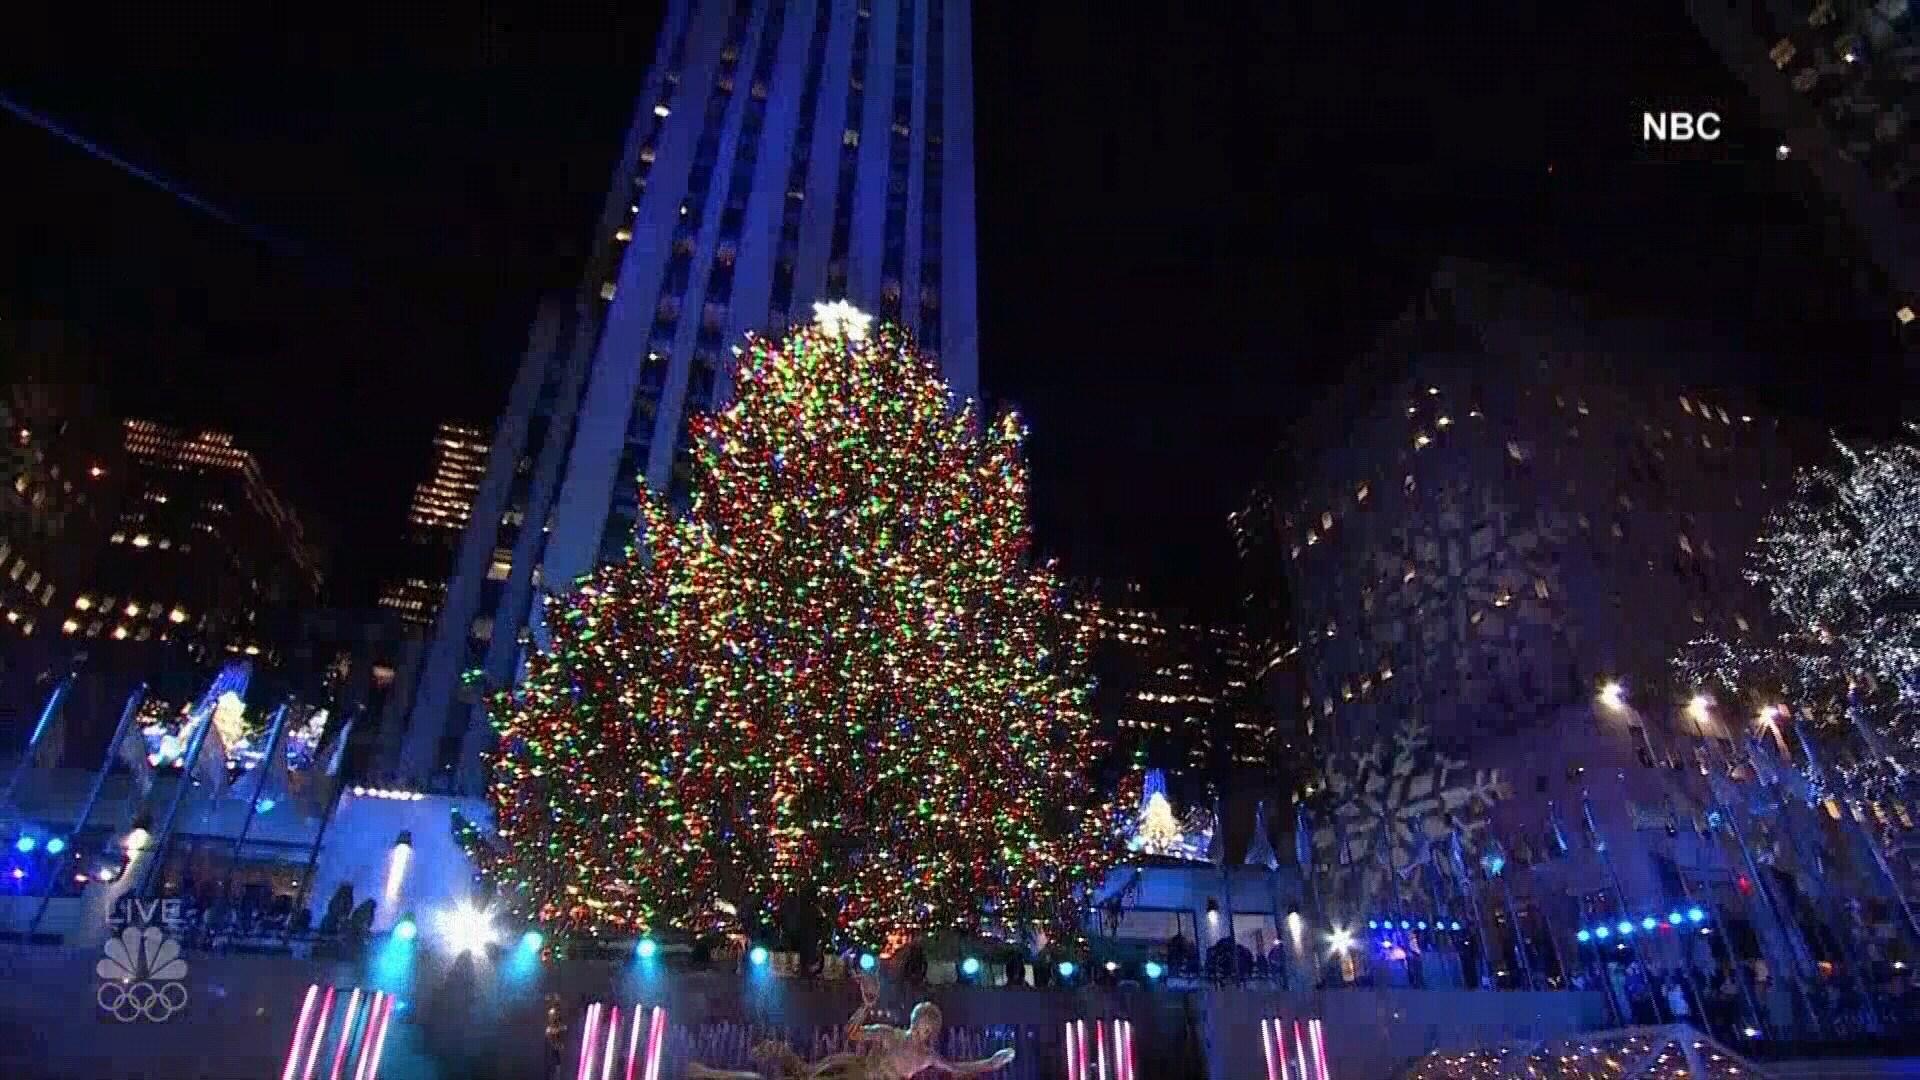 2017 Rockefeller Christmas Tree